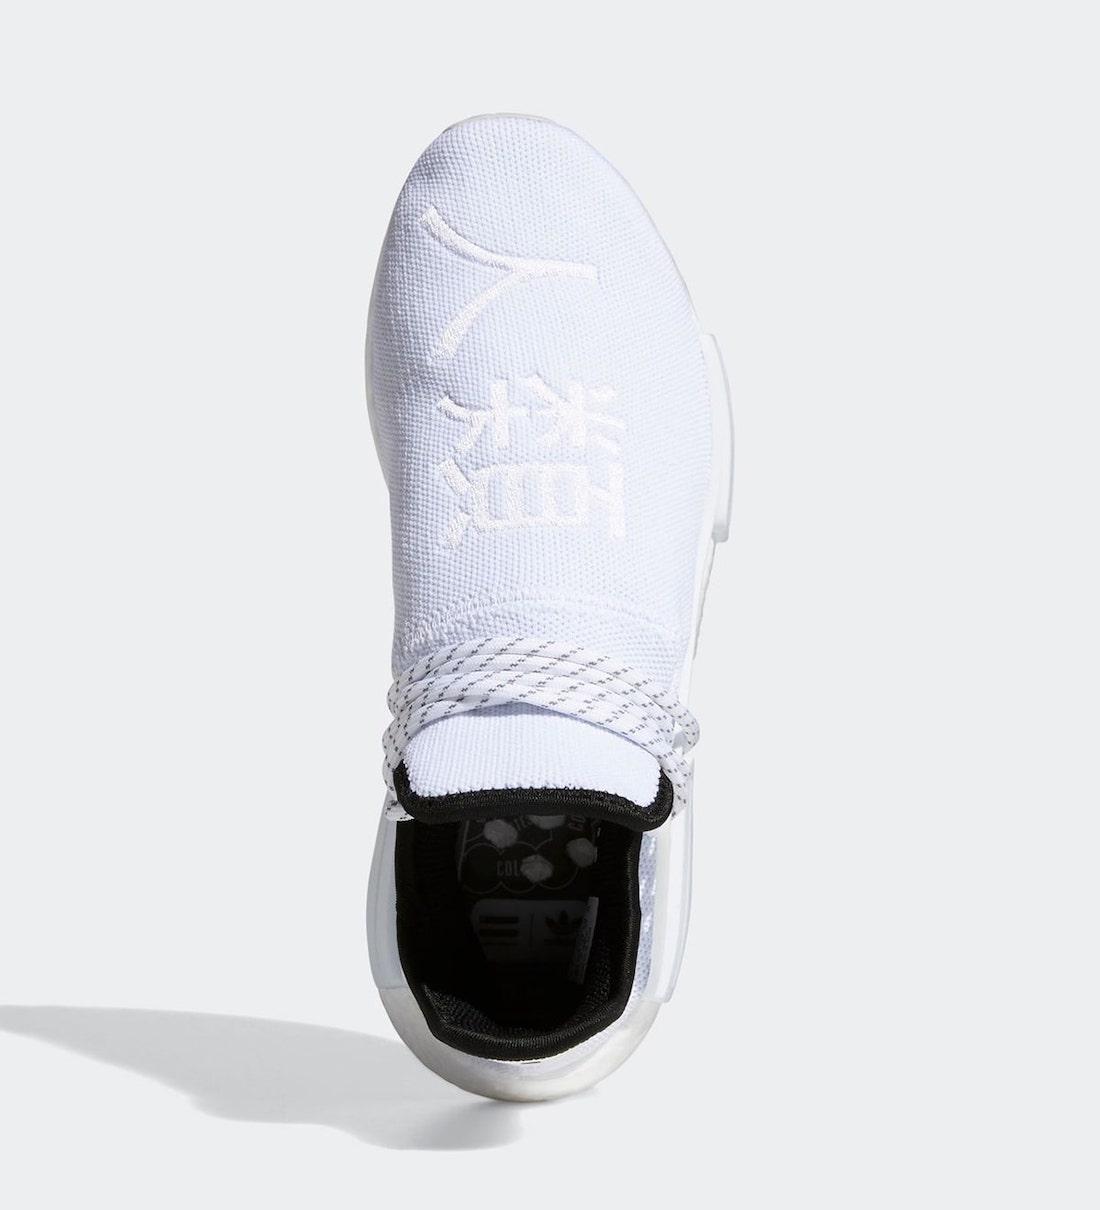 Pharrell x adidas NMD Hu White GY0092 4